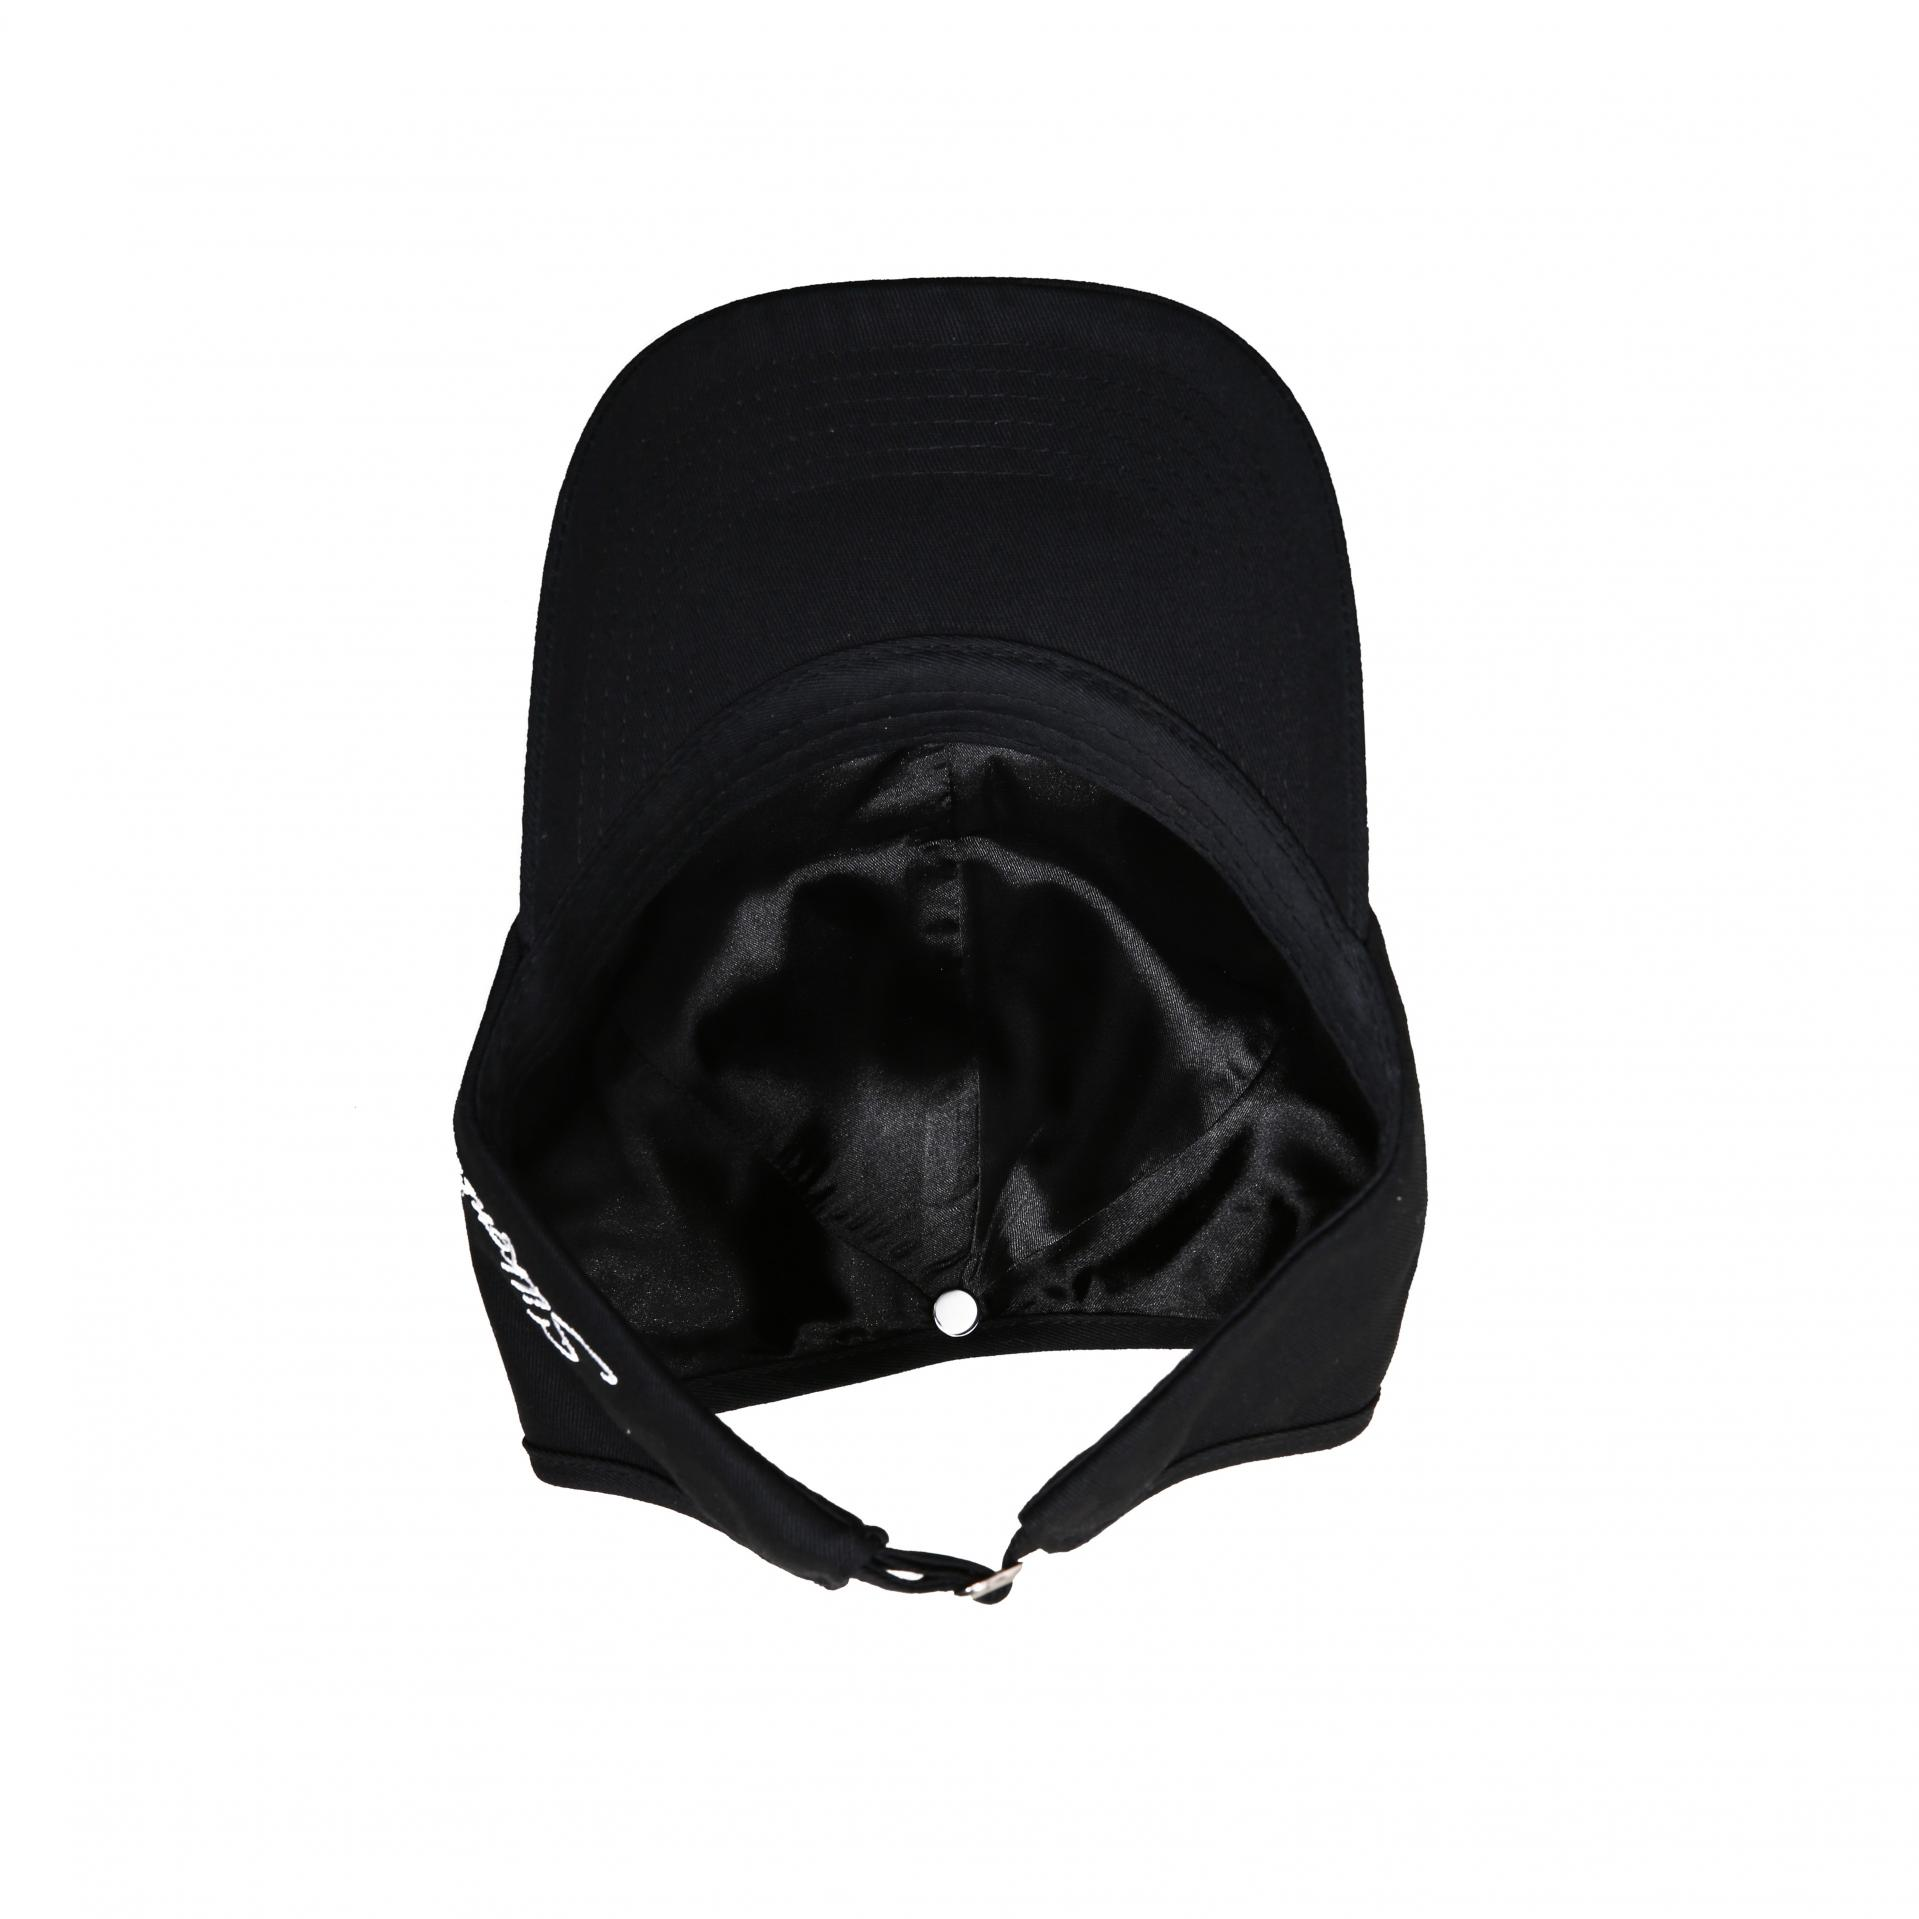 PONYCAP CLASSIC BLACK 3